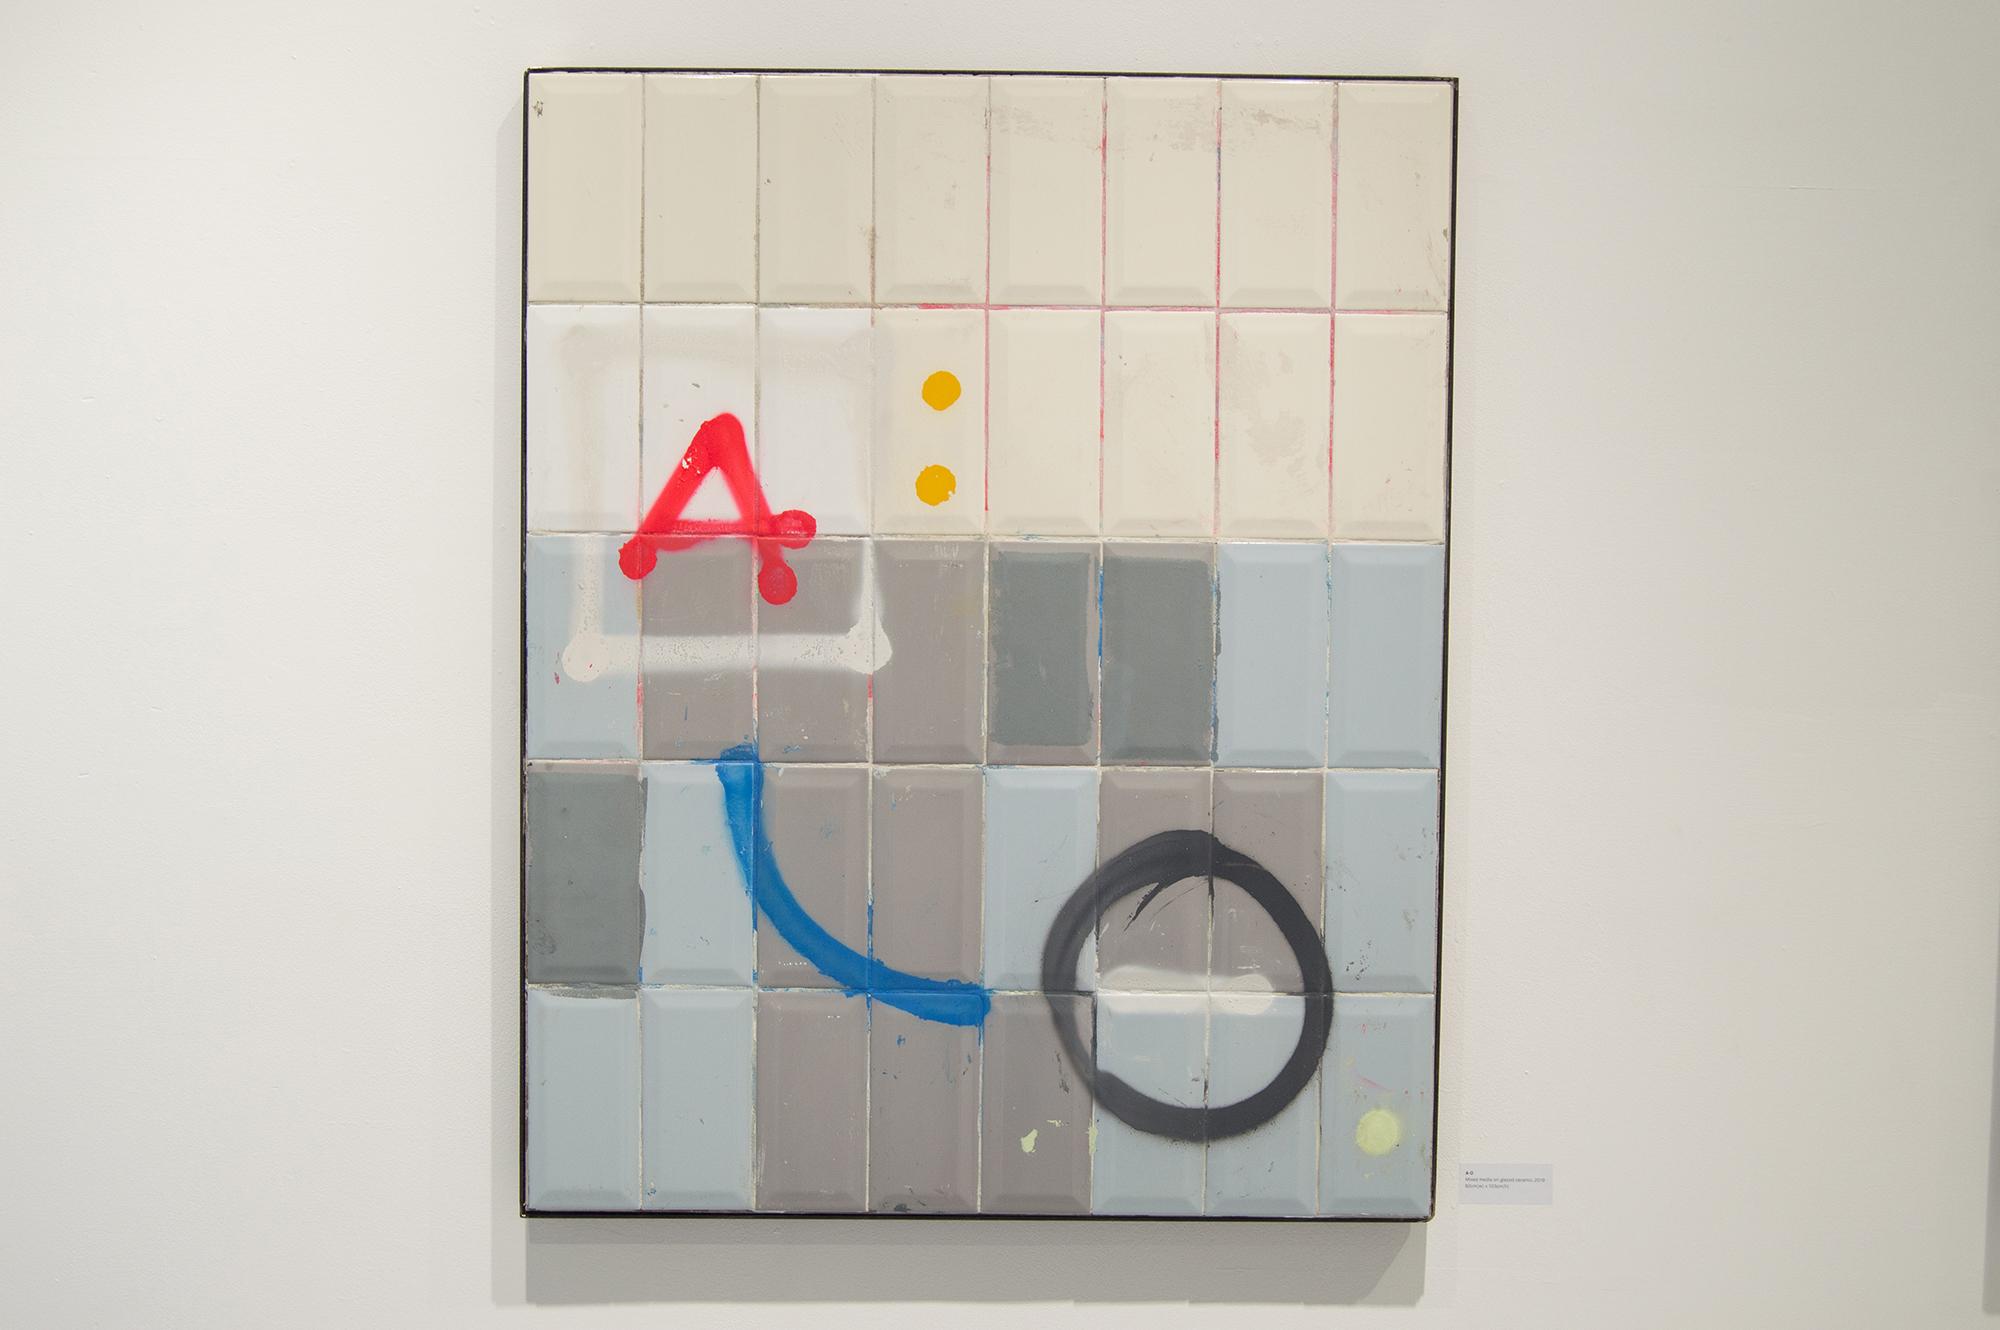 'A-O', 2019, Mixed Media on Glazed Ceramic, 82 x 103cm, Atelier Maser.